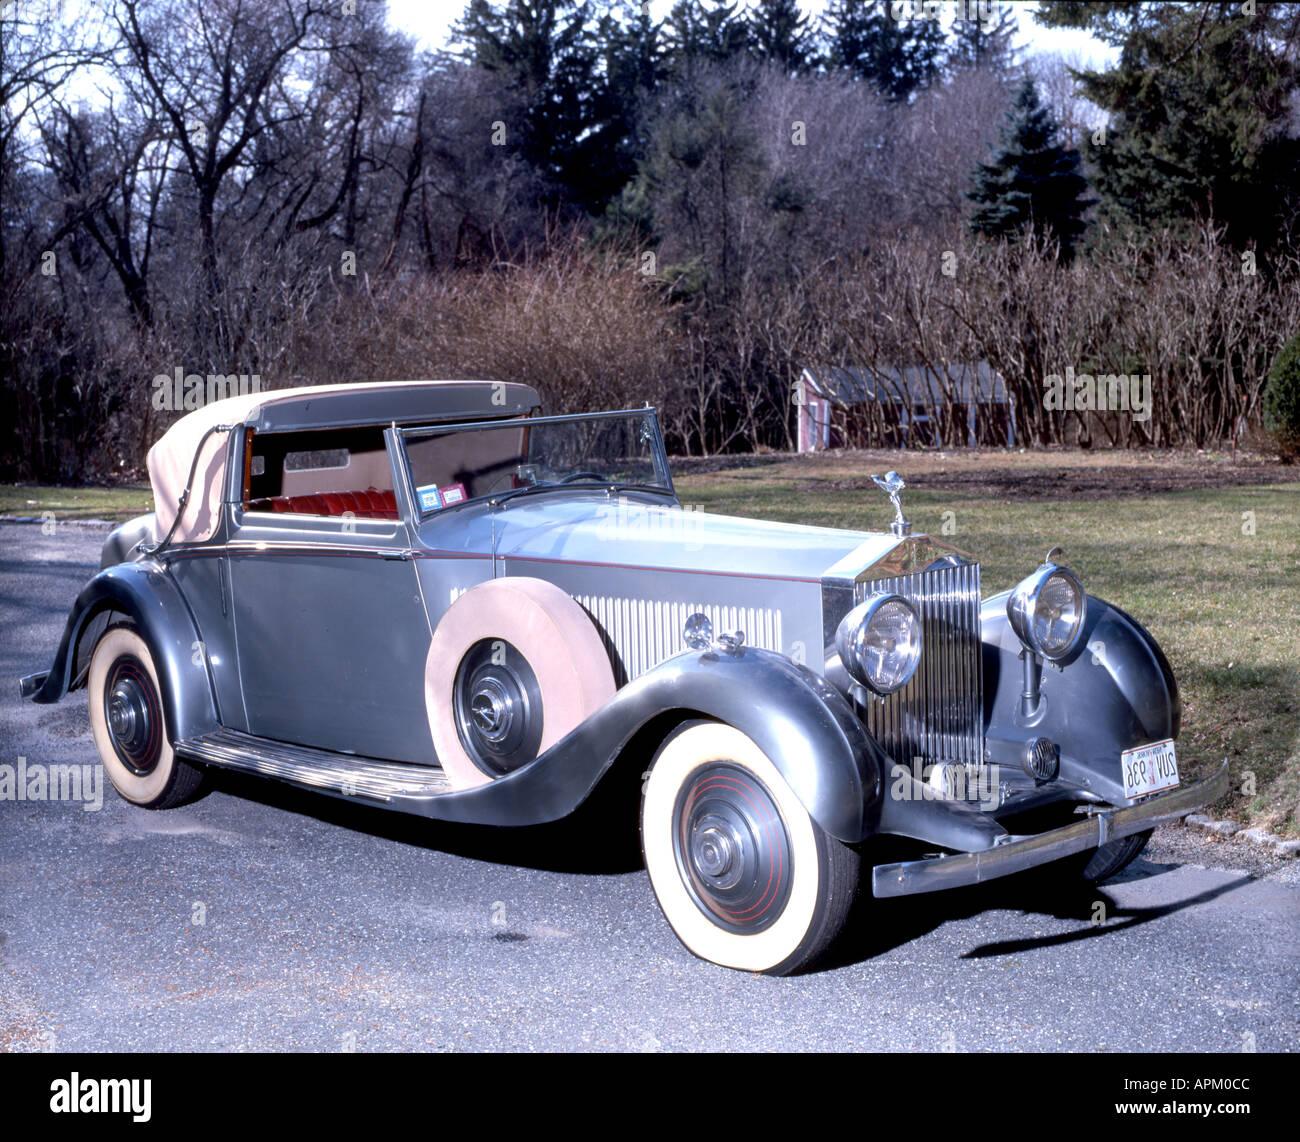 1934 Rolls Royce Phantom 2 Continental Drophead Sedanca